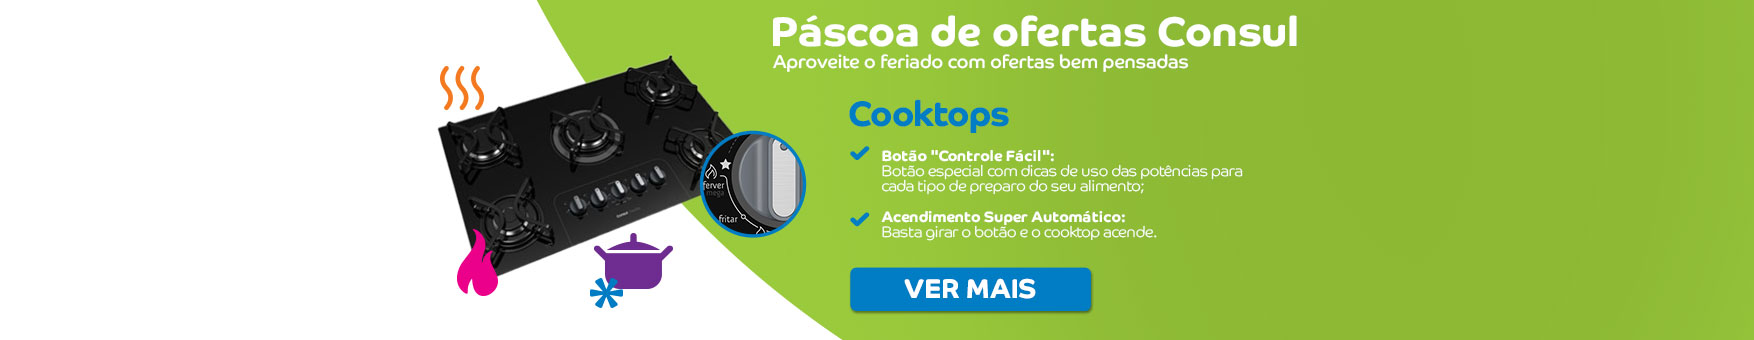 pascoa cooktops